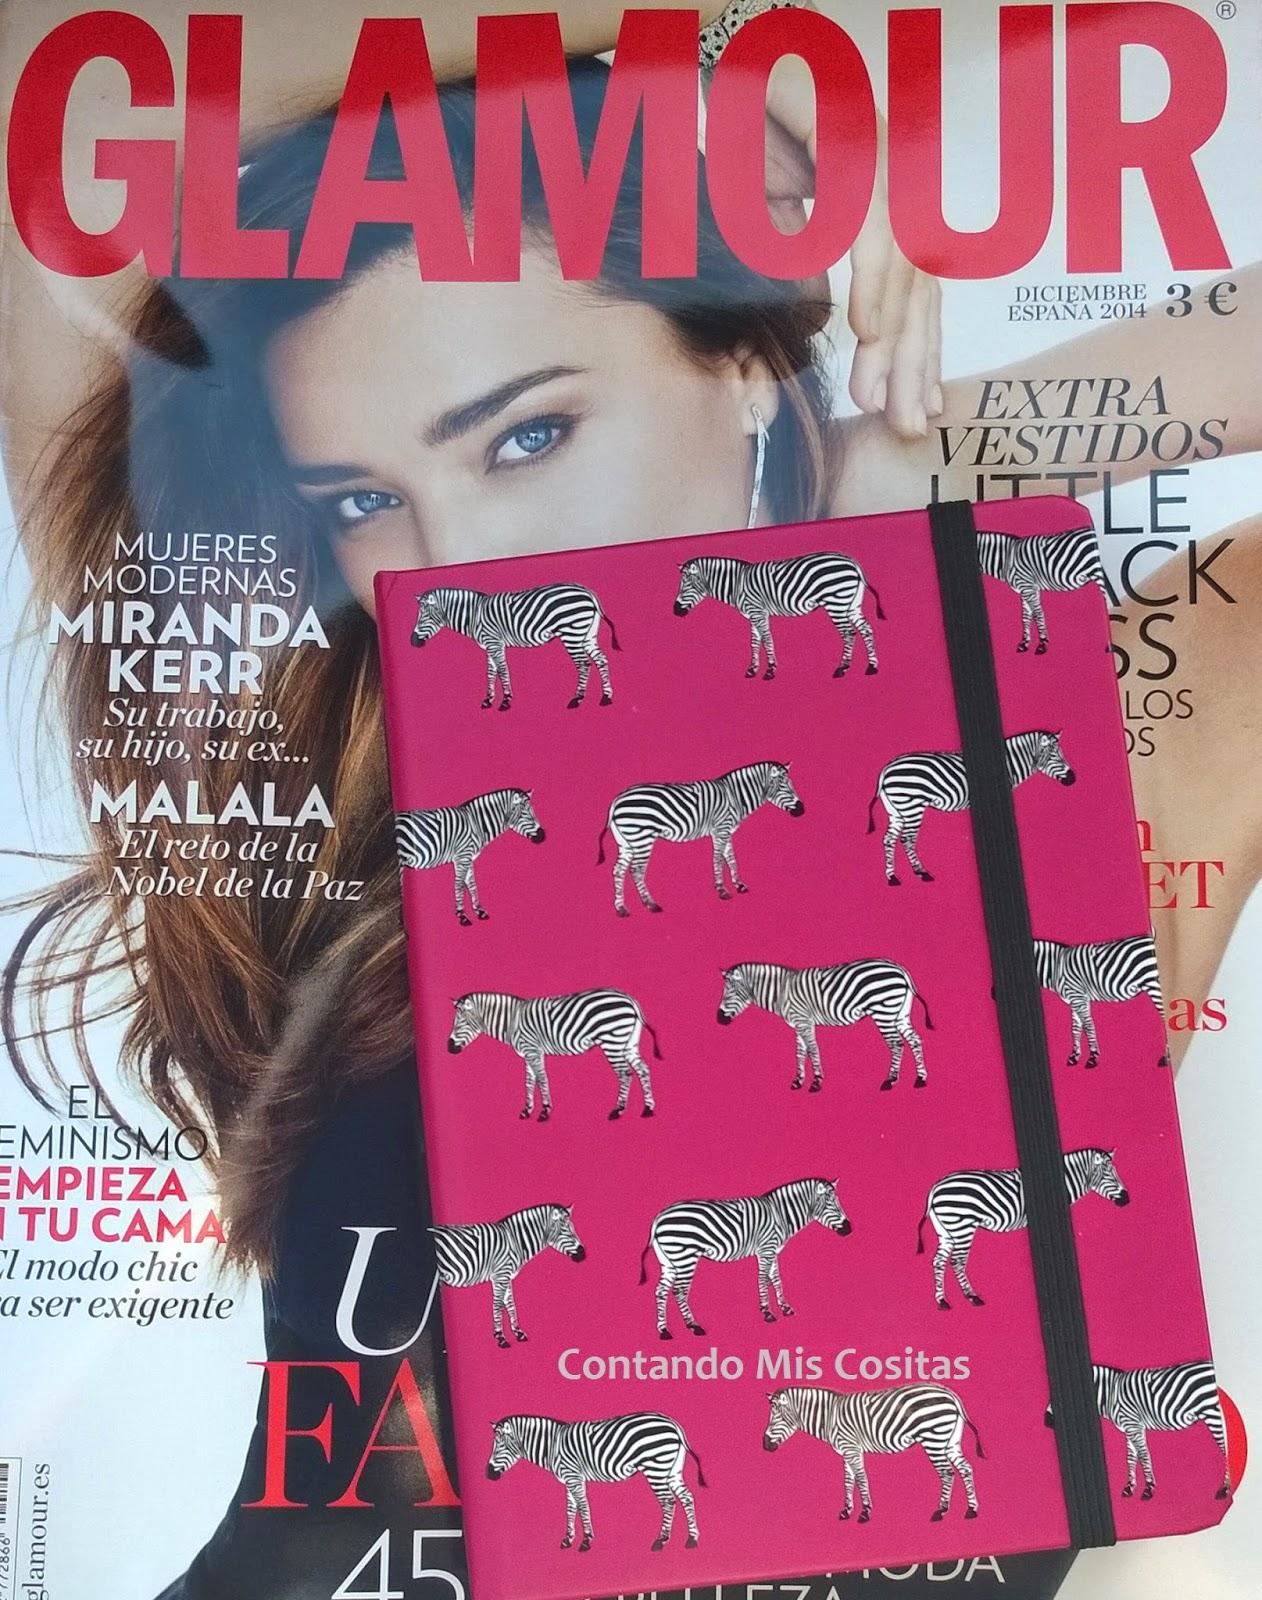 agenda glamour 2015 regalo revista diciembre 2015